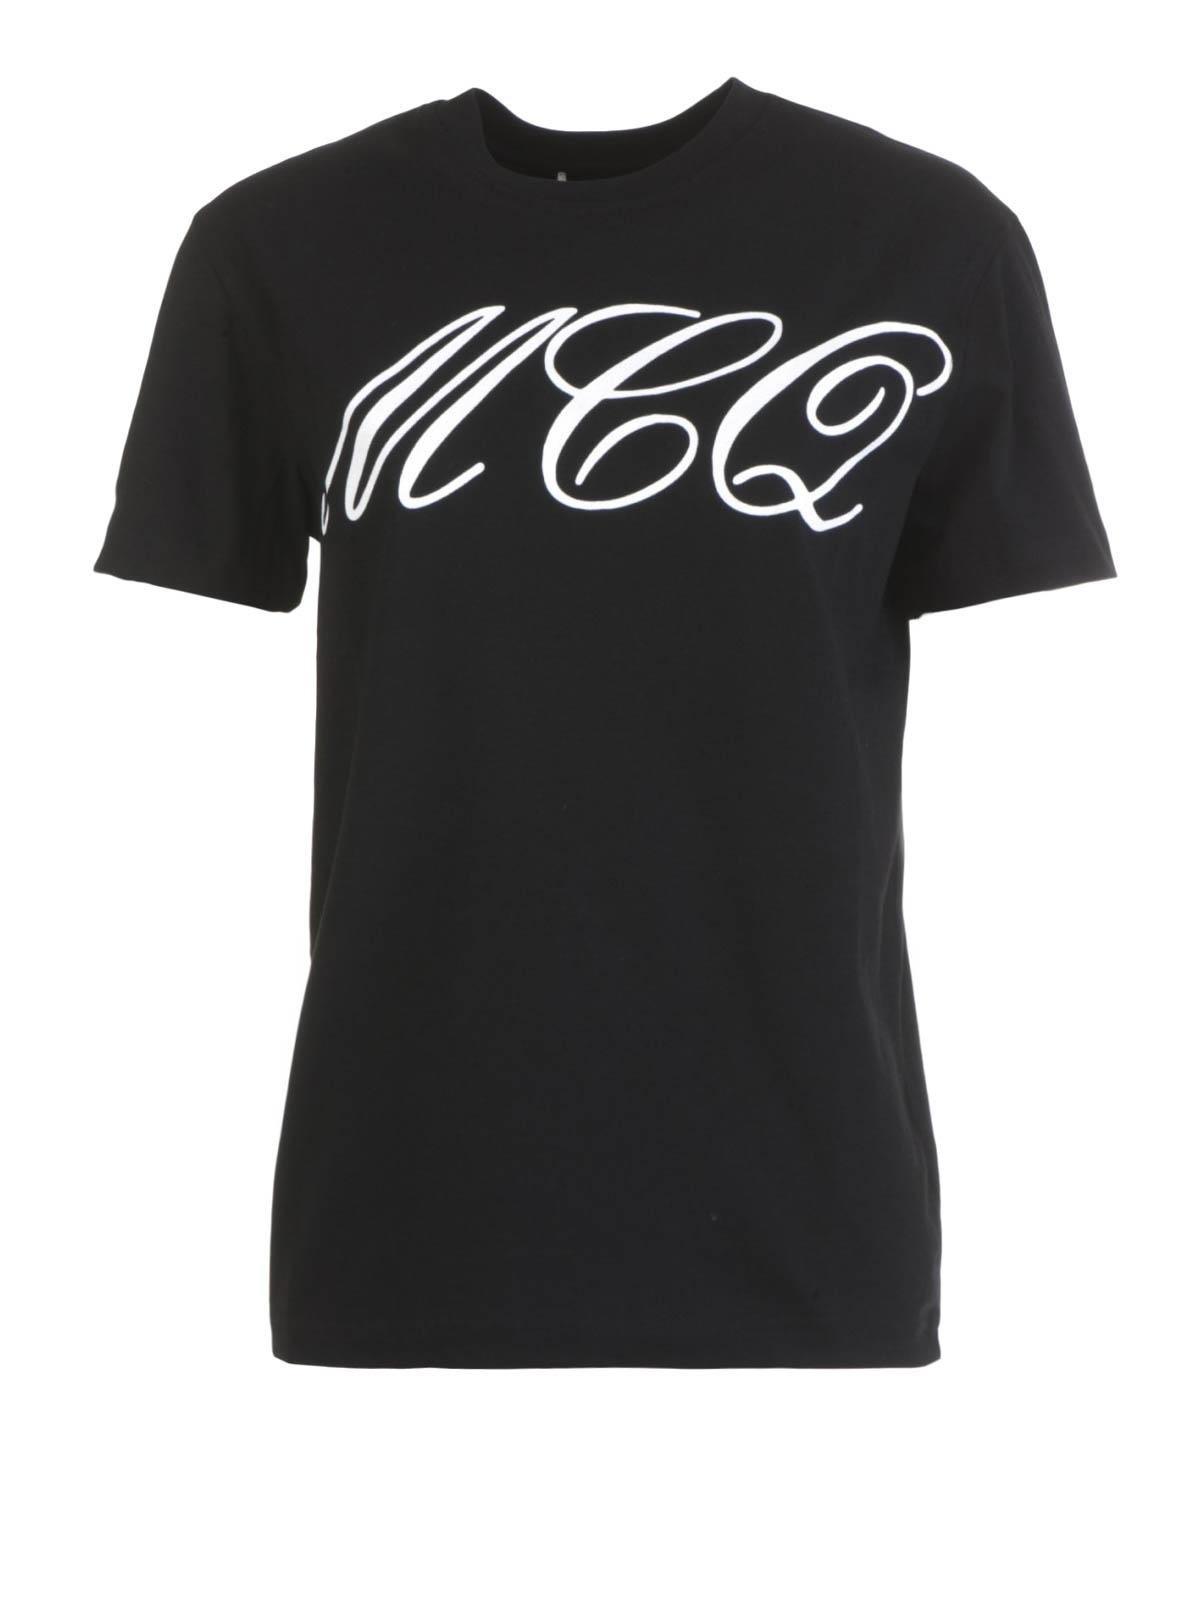 Logo print t shirt by mcq t shirts ikrix for Logos for t shirts printing